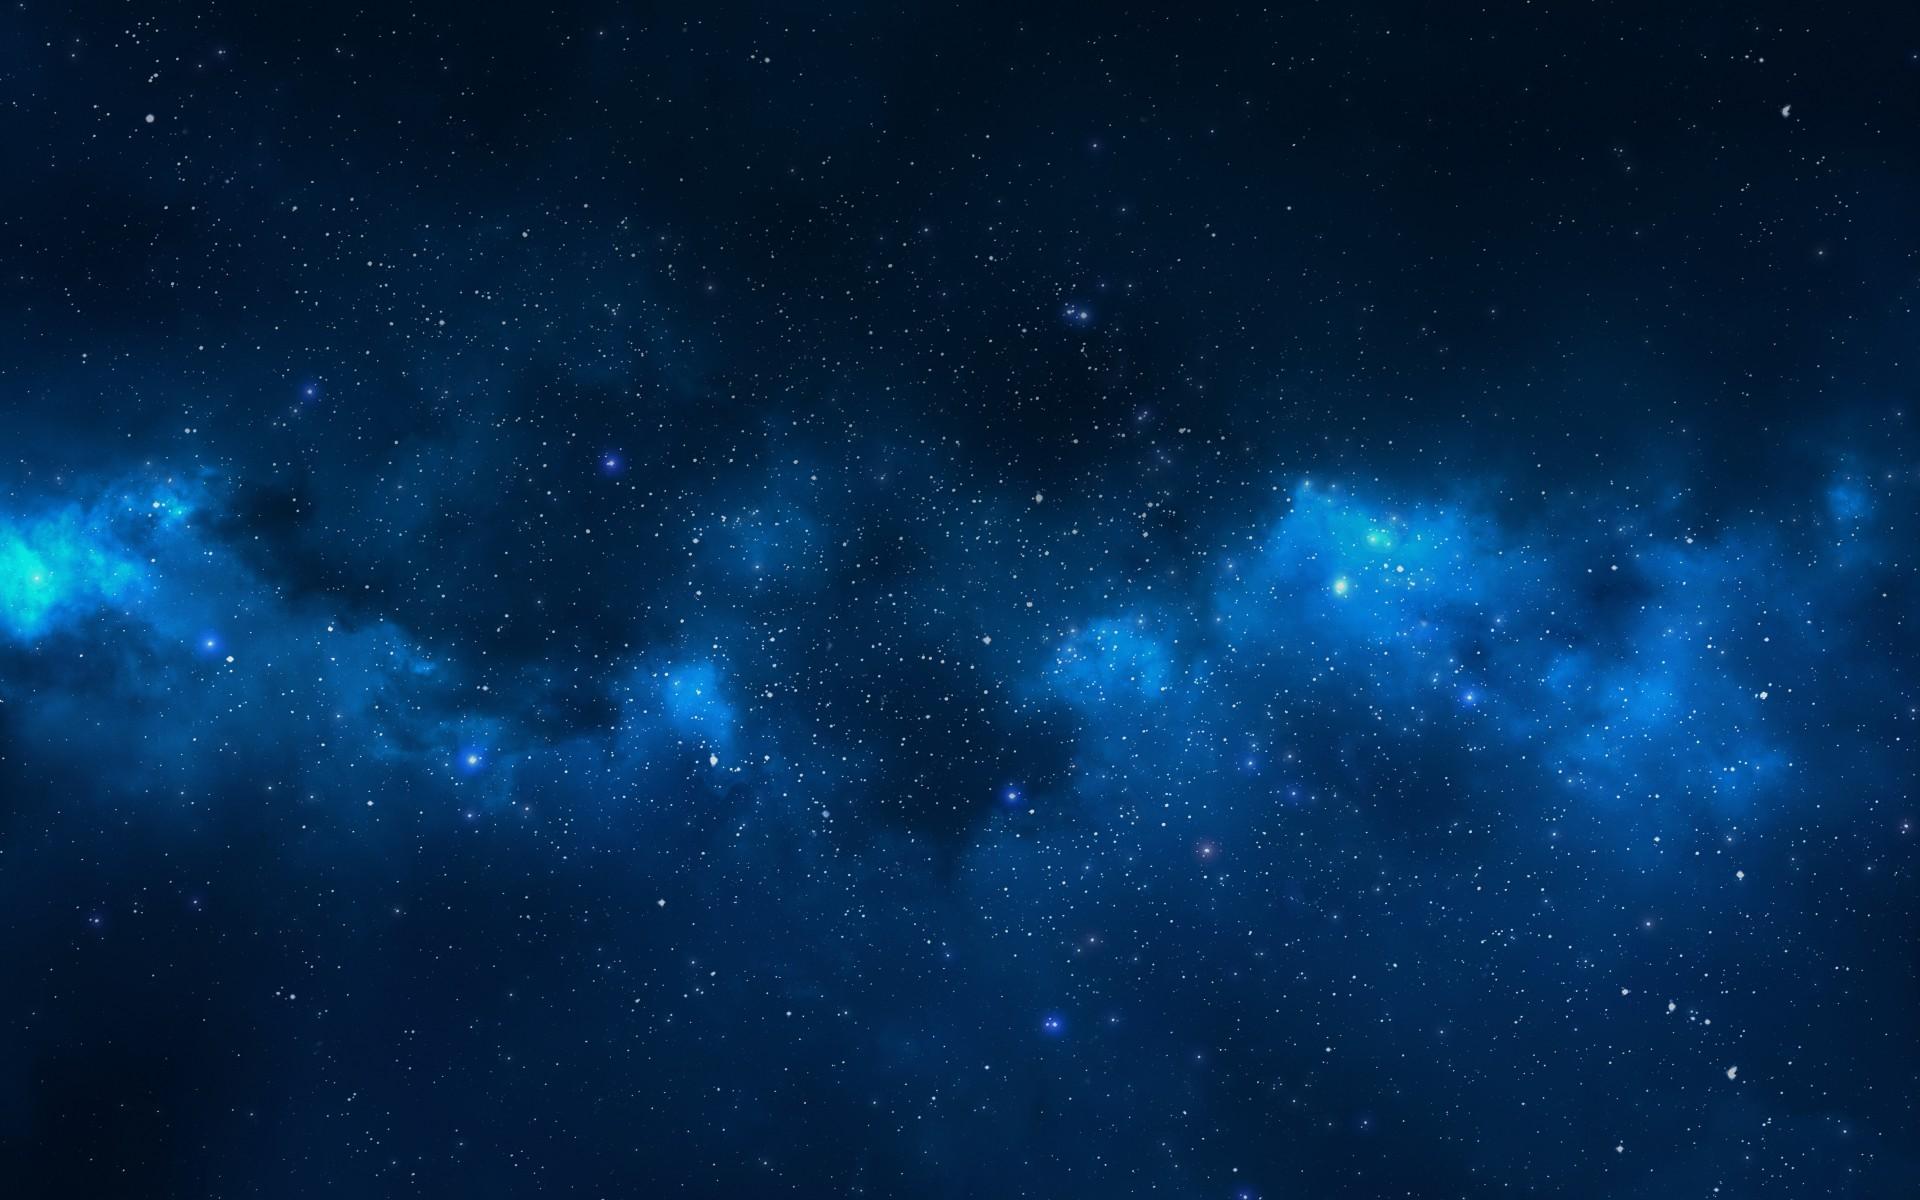 46 Blue Night Sky Wallpaper On Wallpapersafari